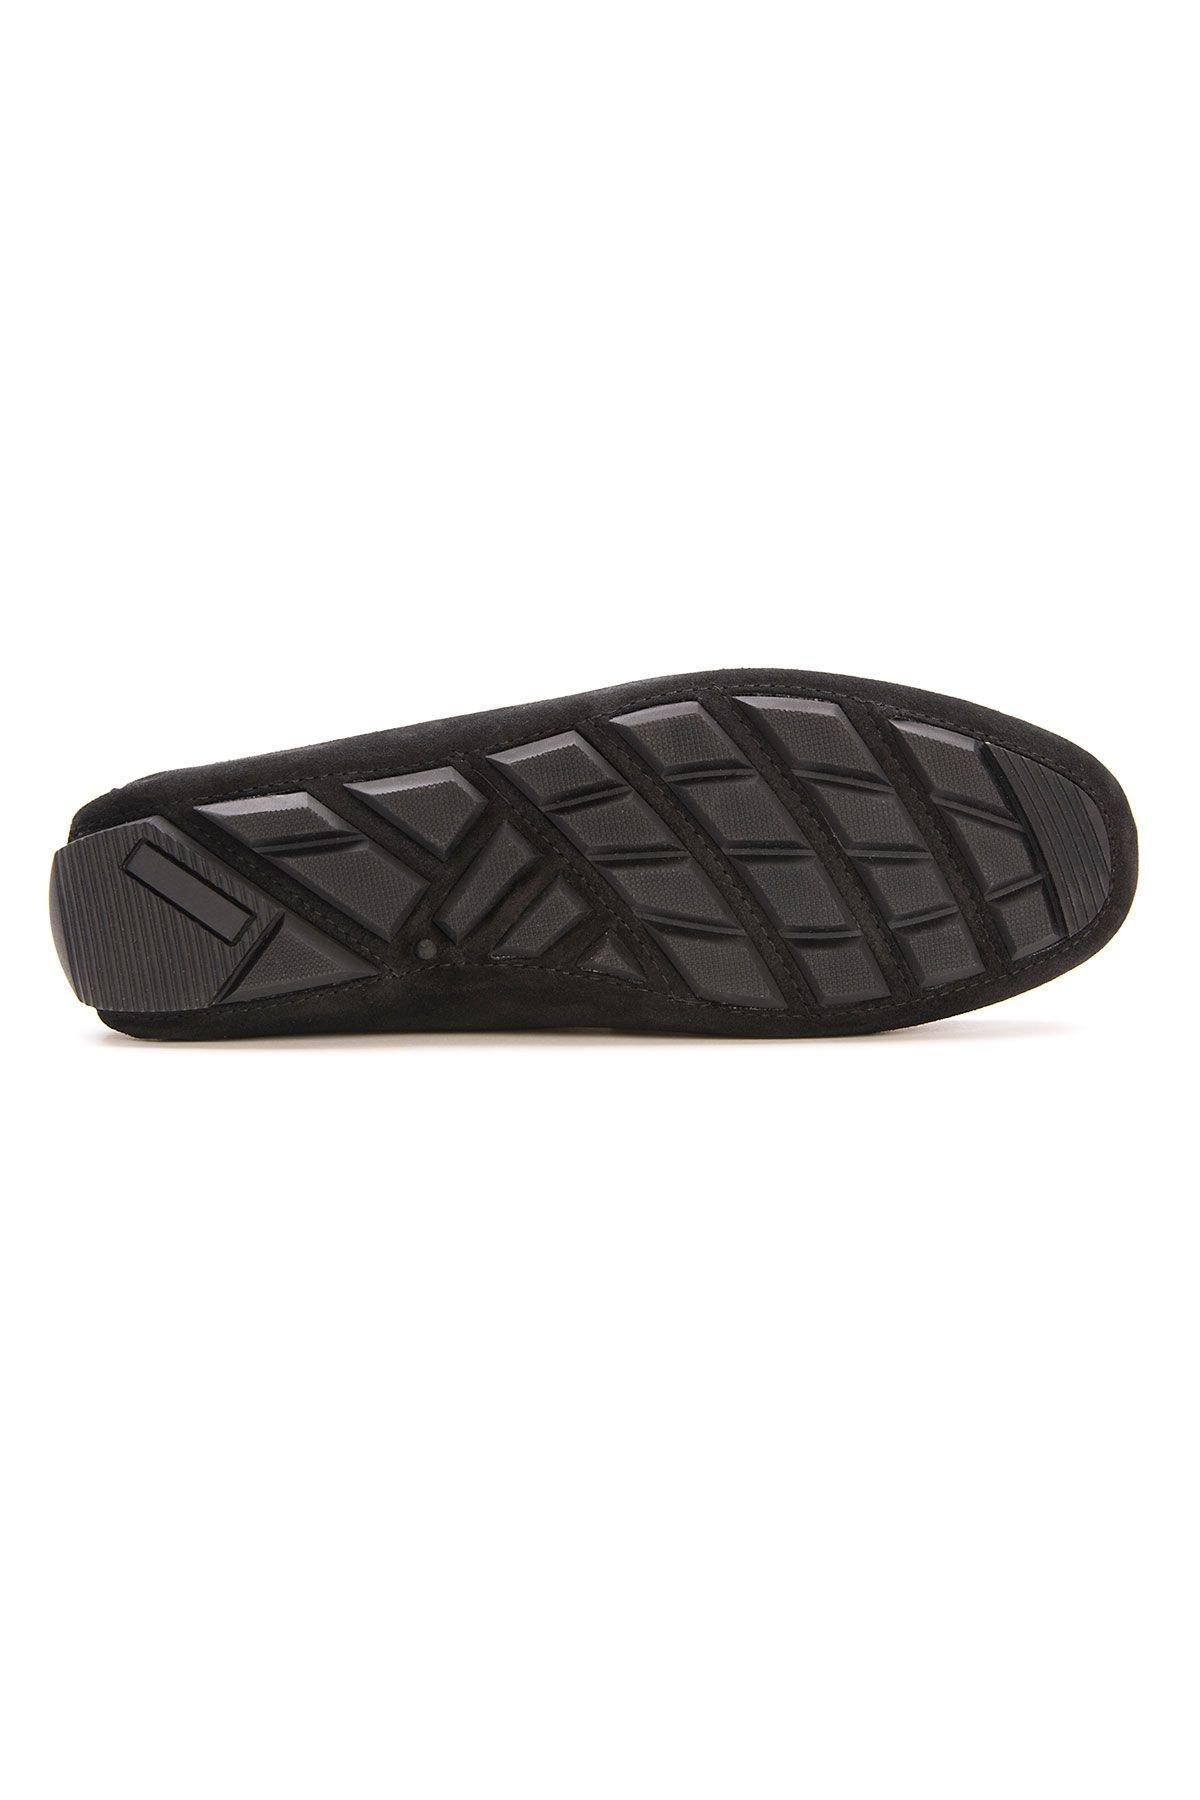 Pegia Genuine Suede Men's Loafer Shoes 500901 Black